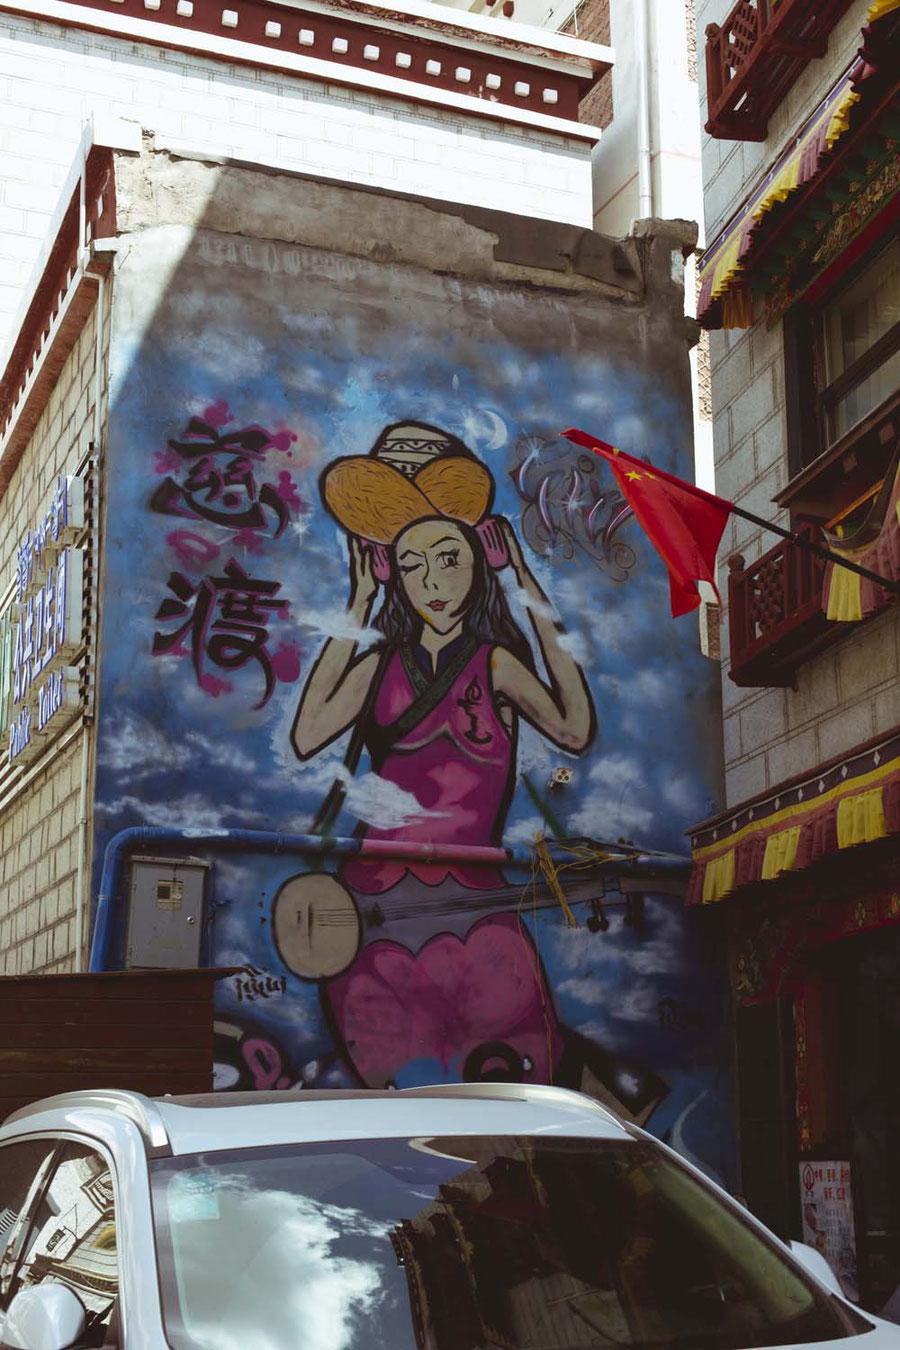 Modern sights, Lhasa, Tibet, China